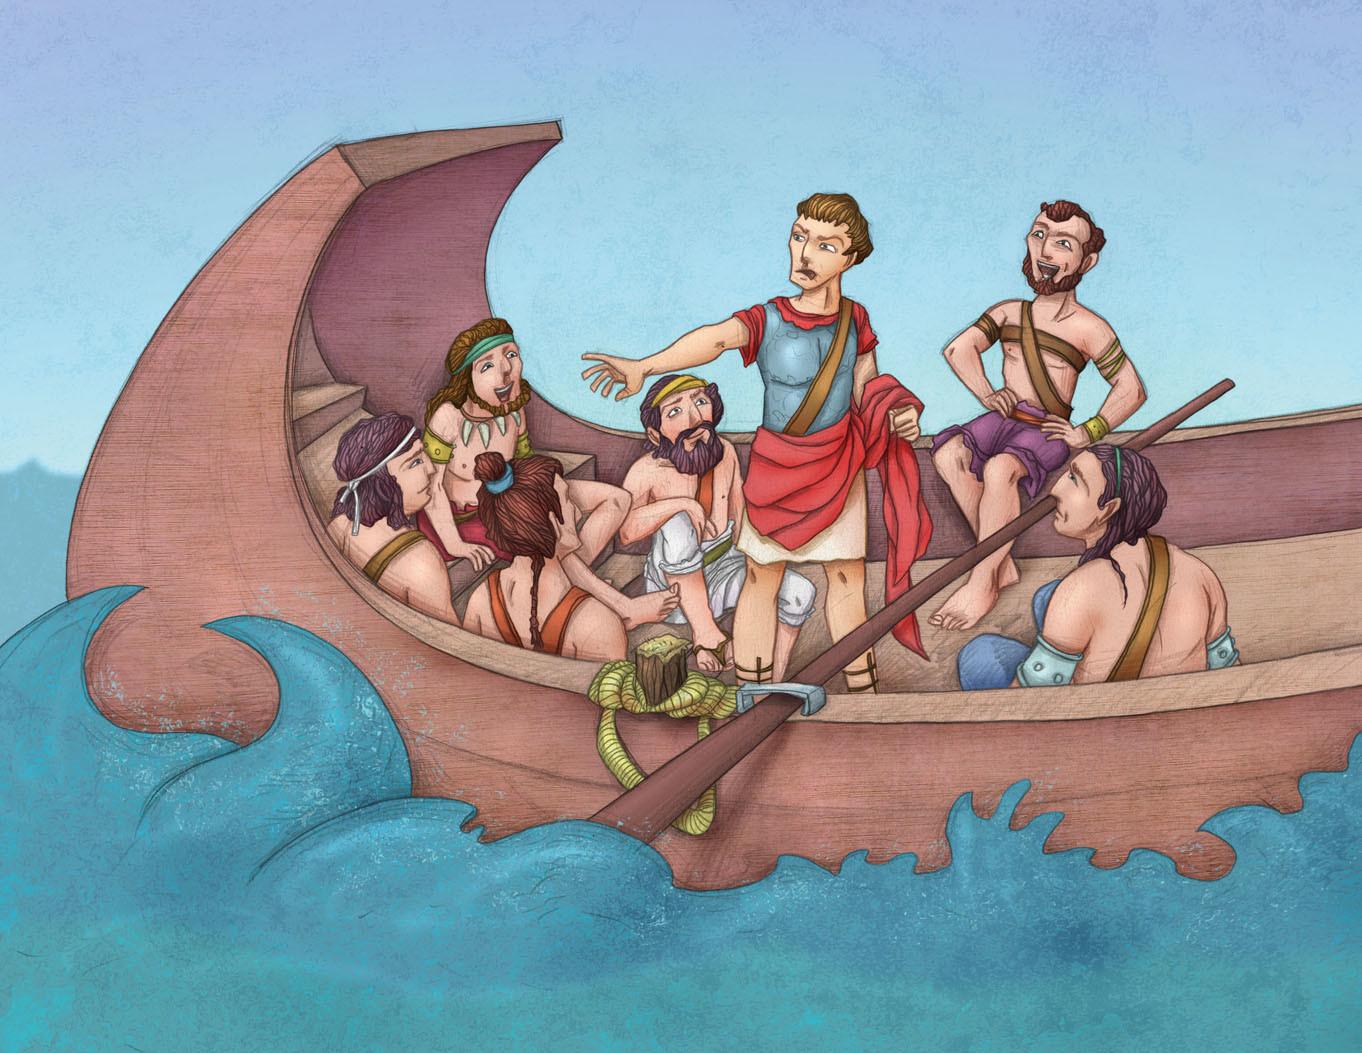 Autogiro illustration studio romans ancient history